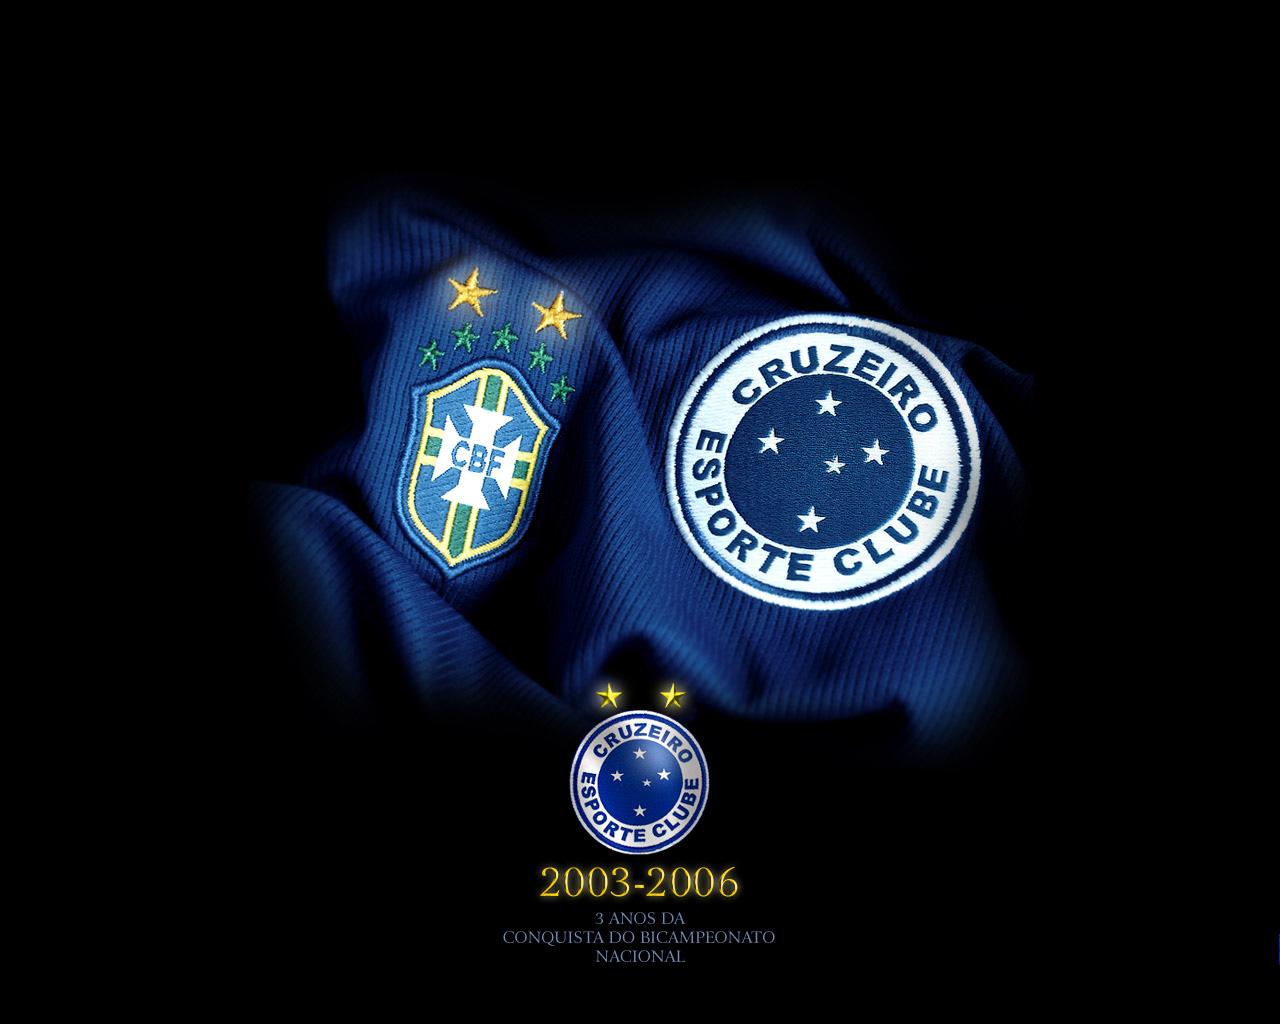 Cruzeiro Esporte Clube Wallpapers 9f23fc146afb4